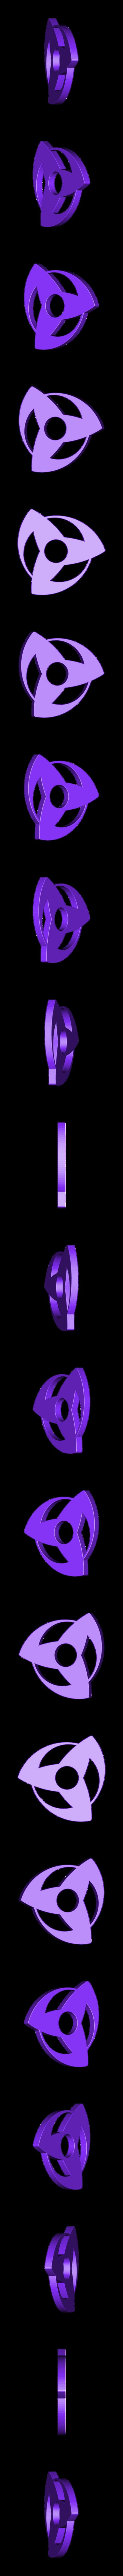 Naruto.stl Download STL file Hand Spinner Naruto • 3D printer template, Guich